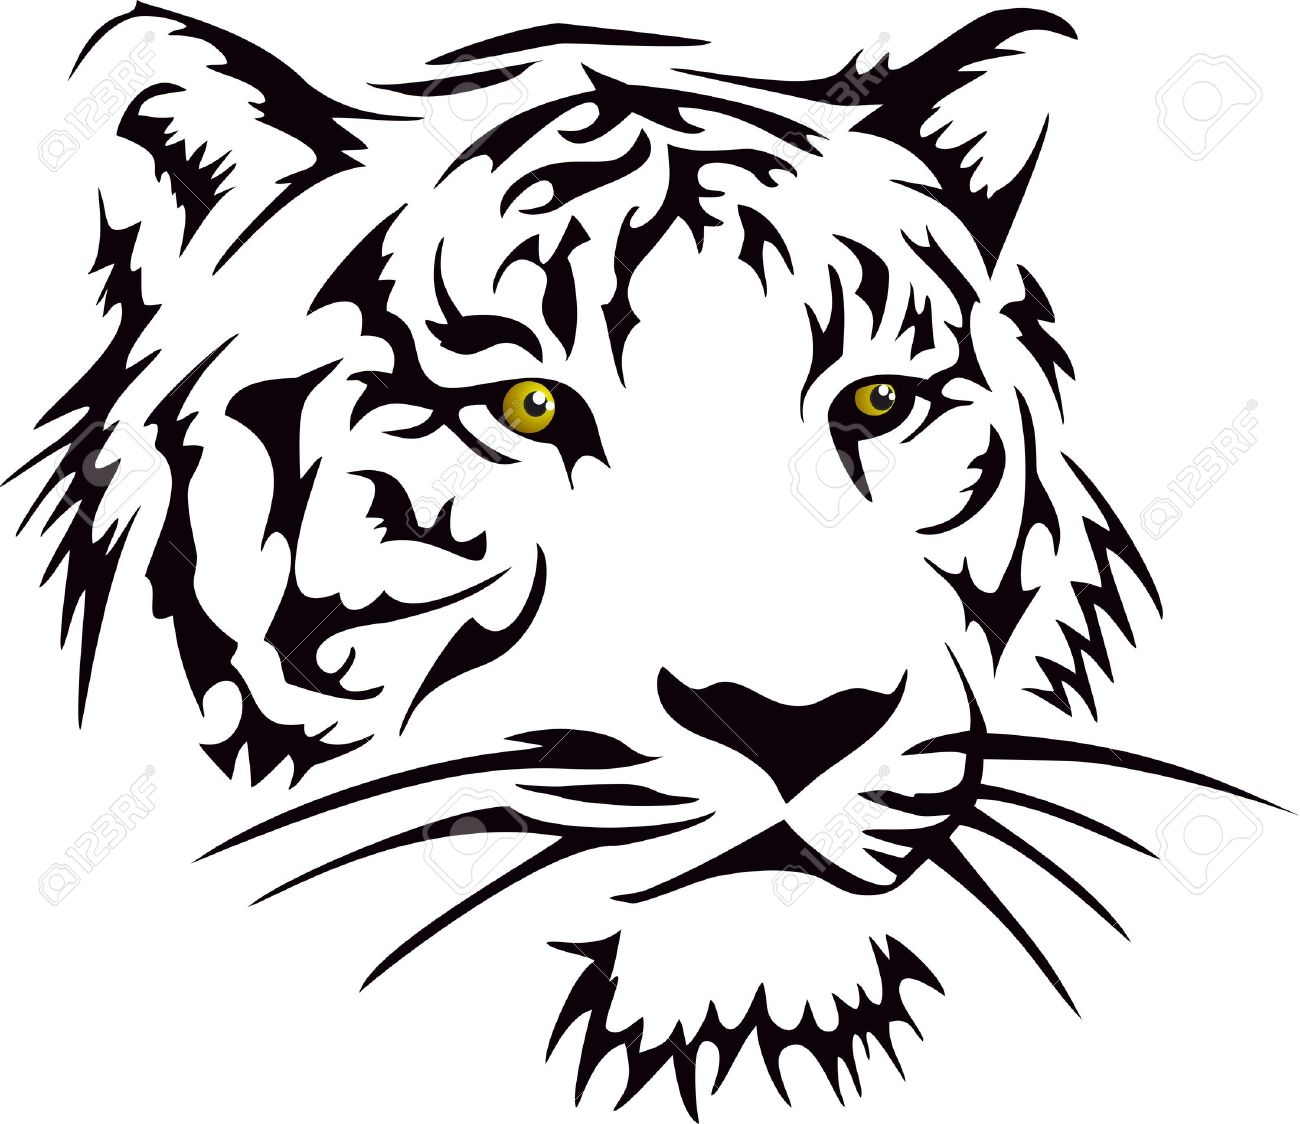 Wild white tiger tattoo tattoo designs ideas gallery share this biocorpaavc